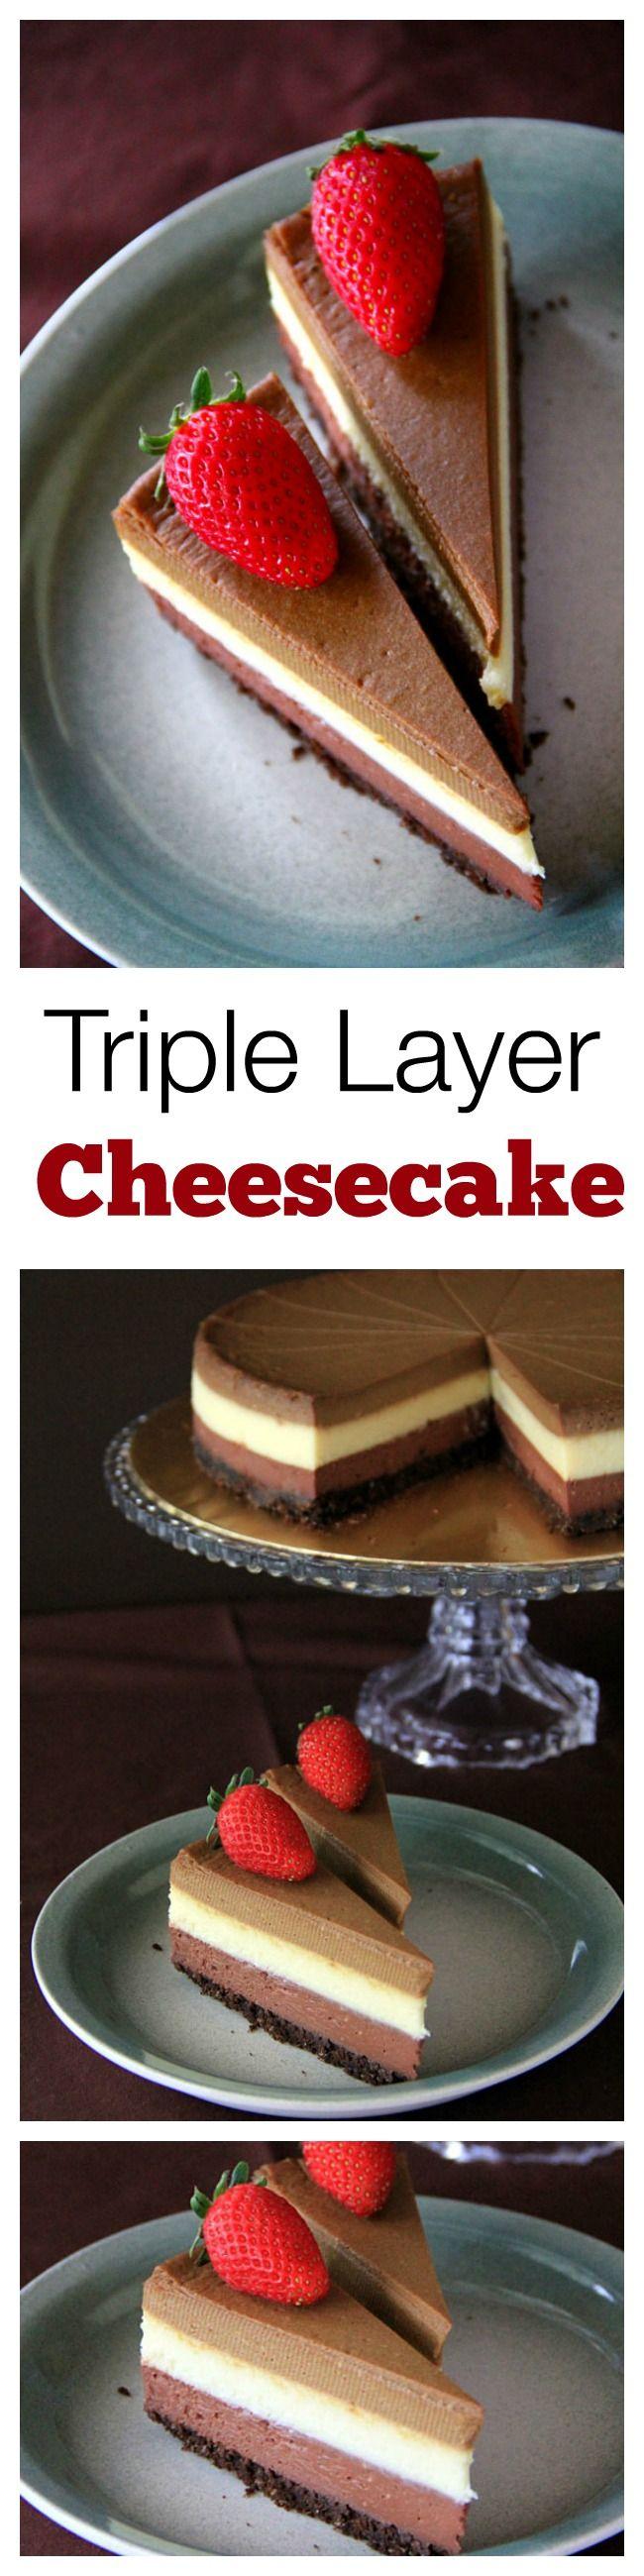 Triple Layer Cheesecake – the BEST, creamiest, richest cheesecake you'll ever make, in dark chocolate, white chocolate & Kahlua coffee flavor | rasamalaysia.com